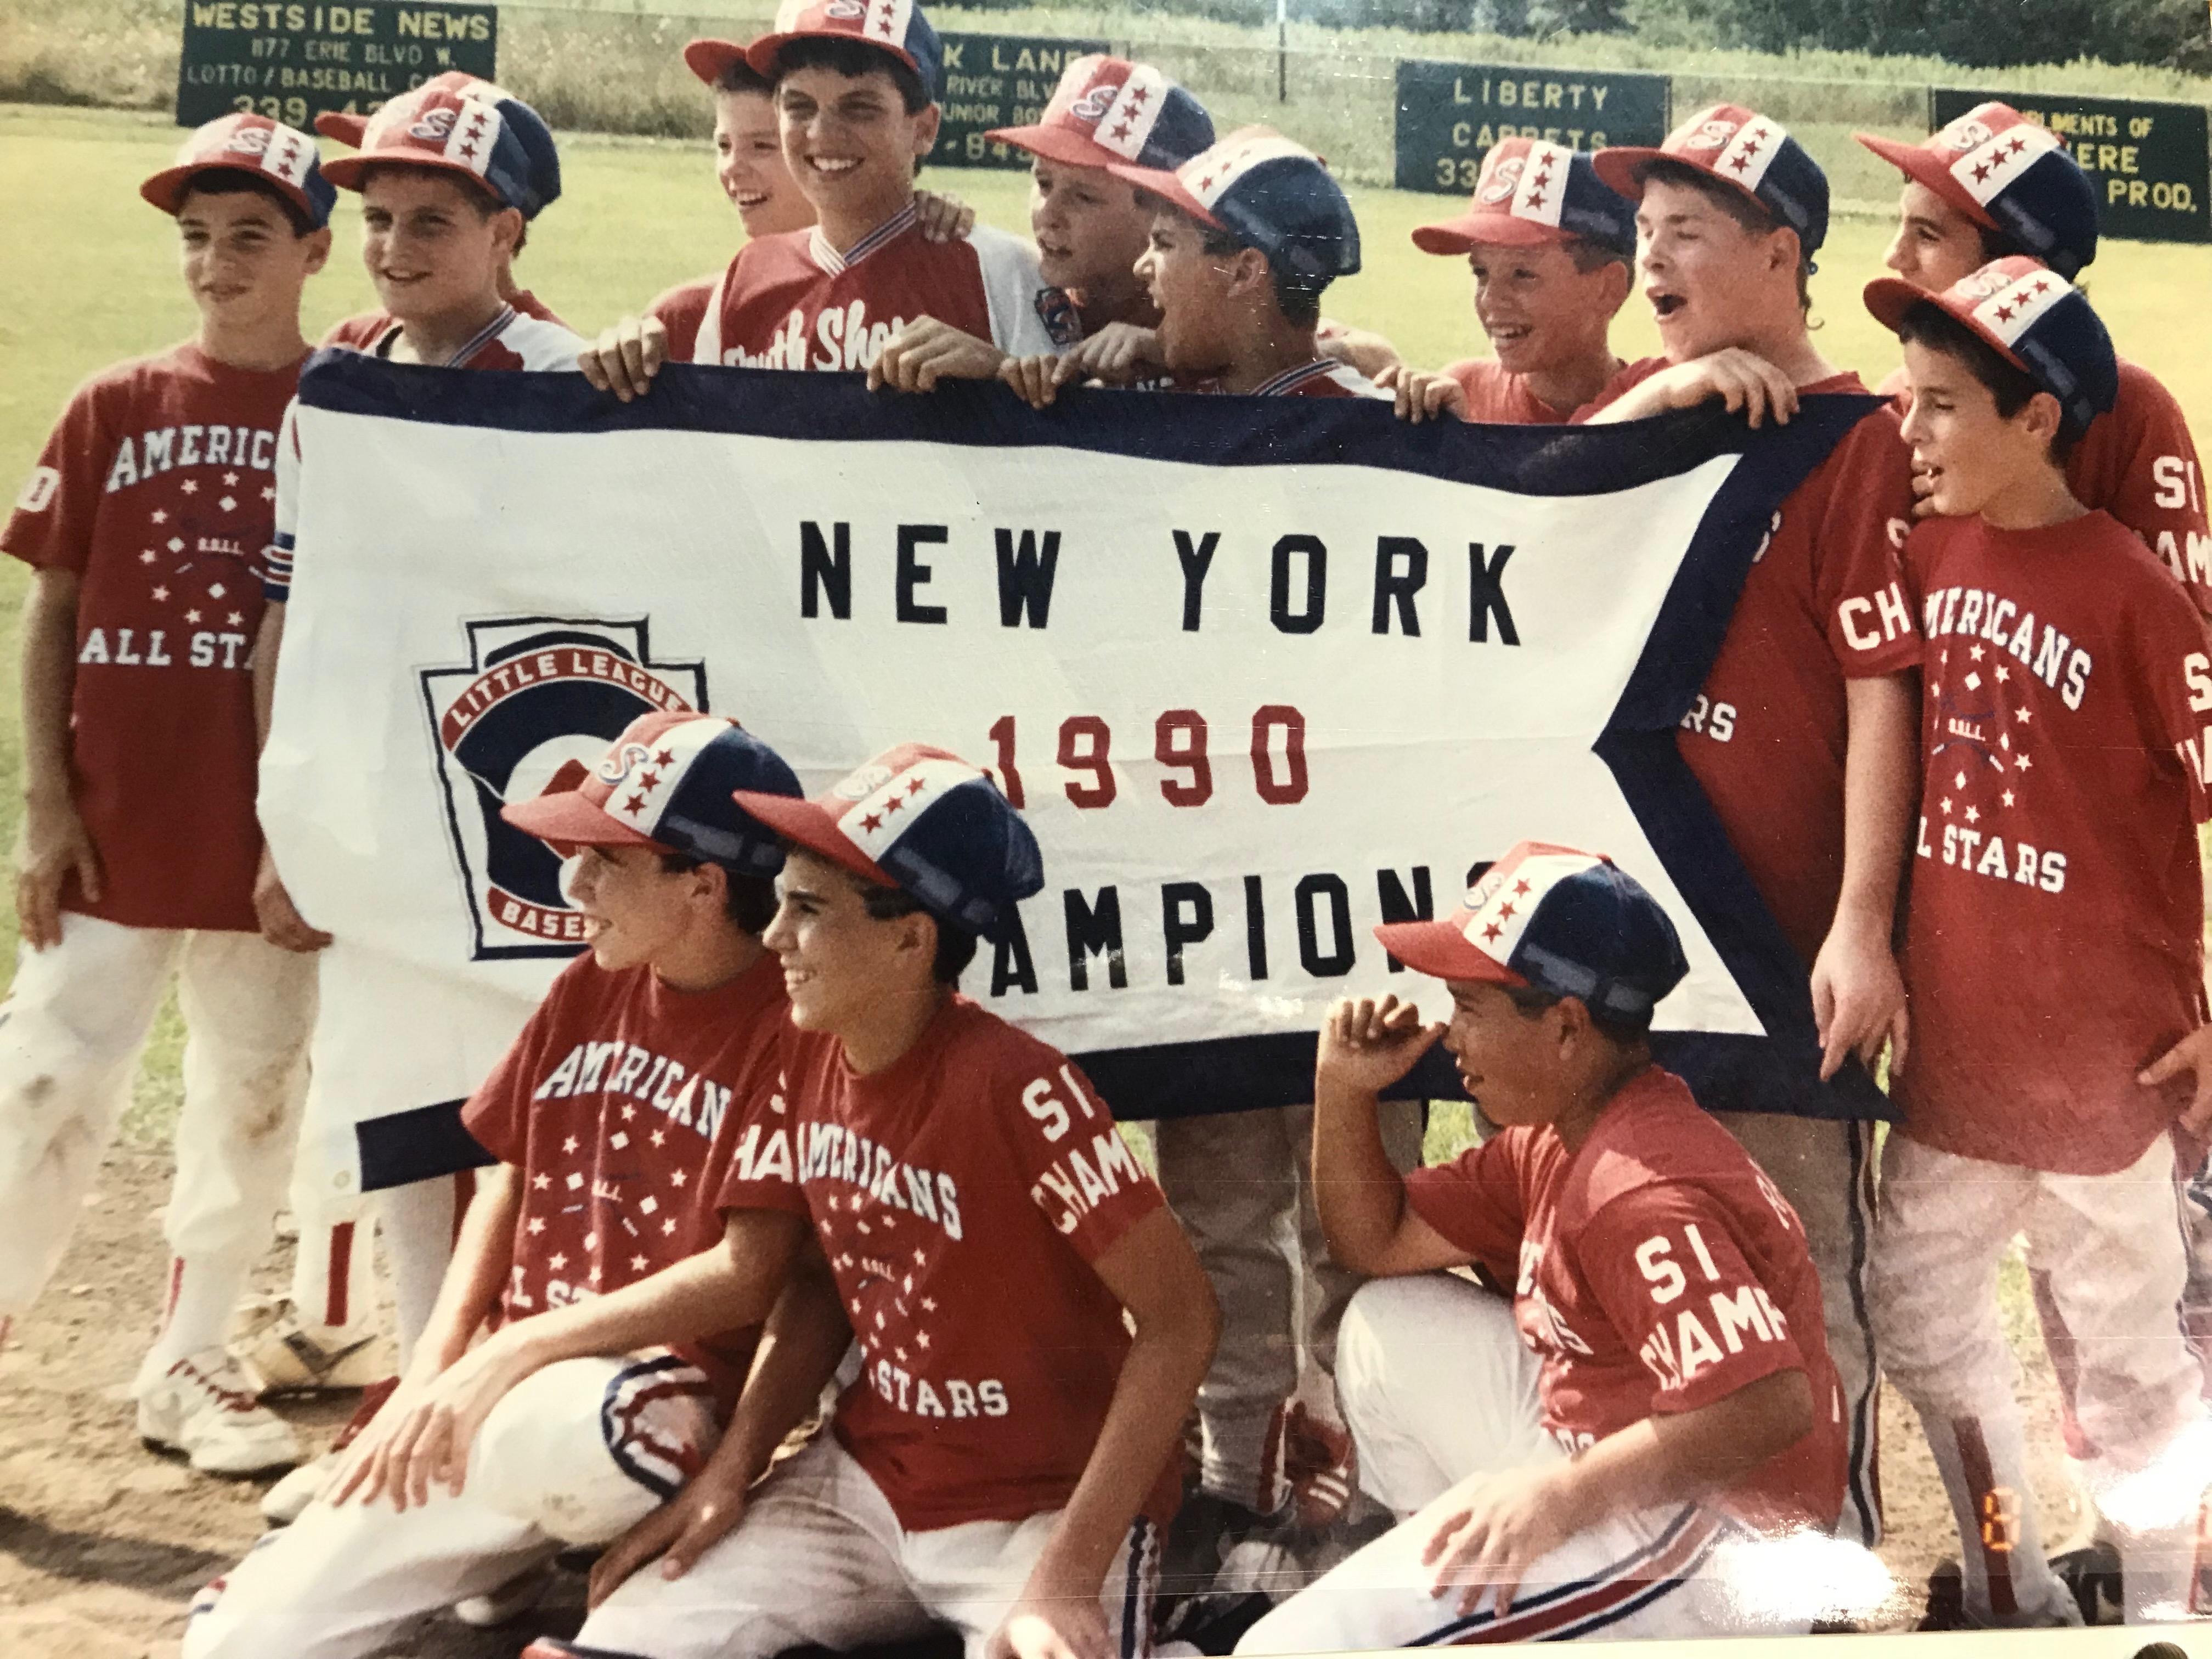 LL NYS All-Star 12s baseball: Vin Nichilo's best All-Star memory involved teammate's shining moment